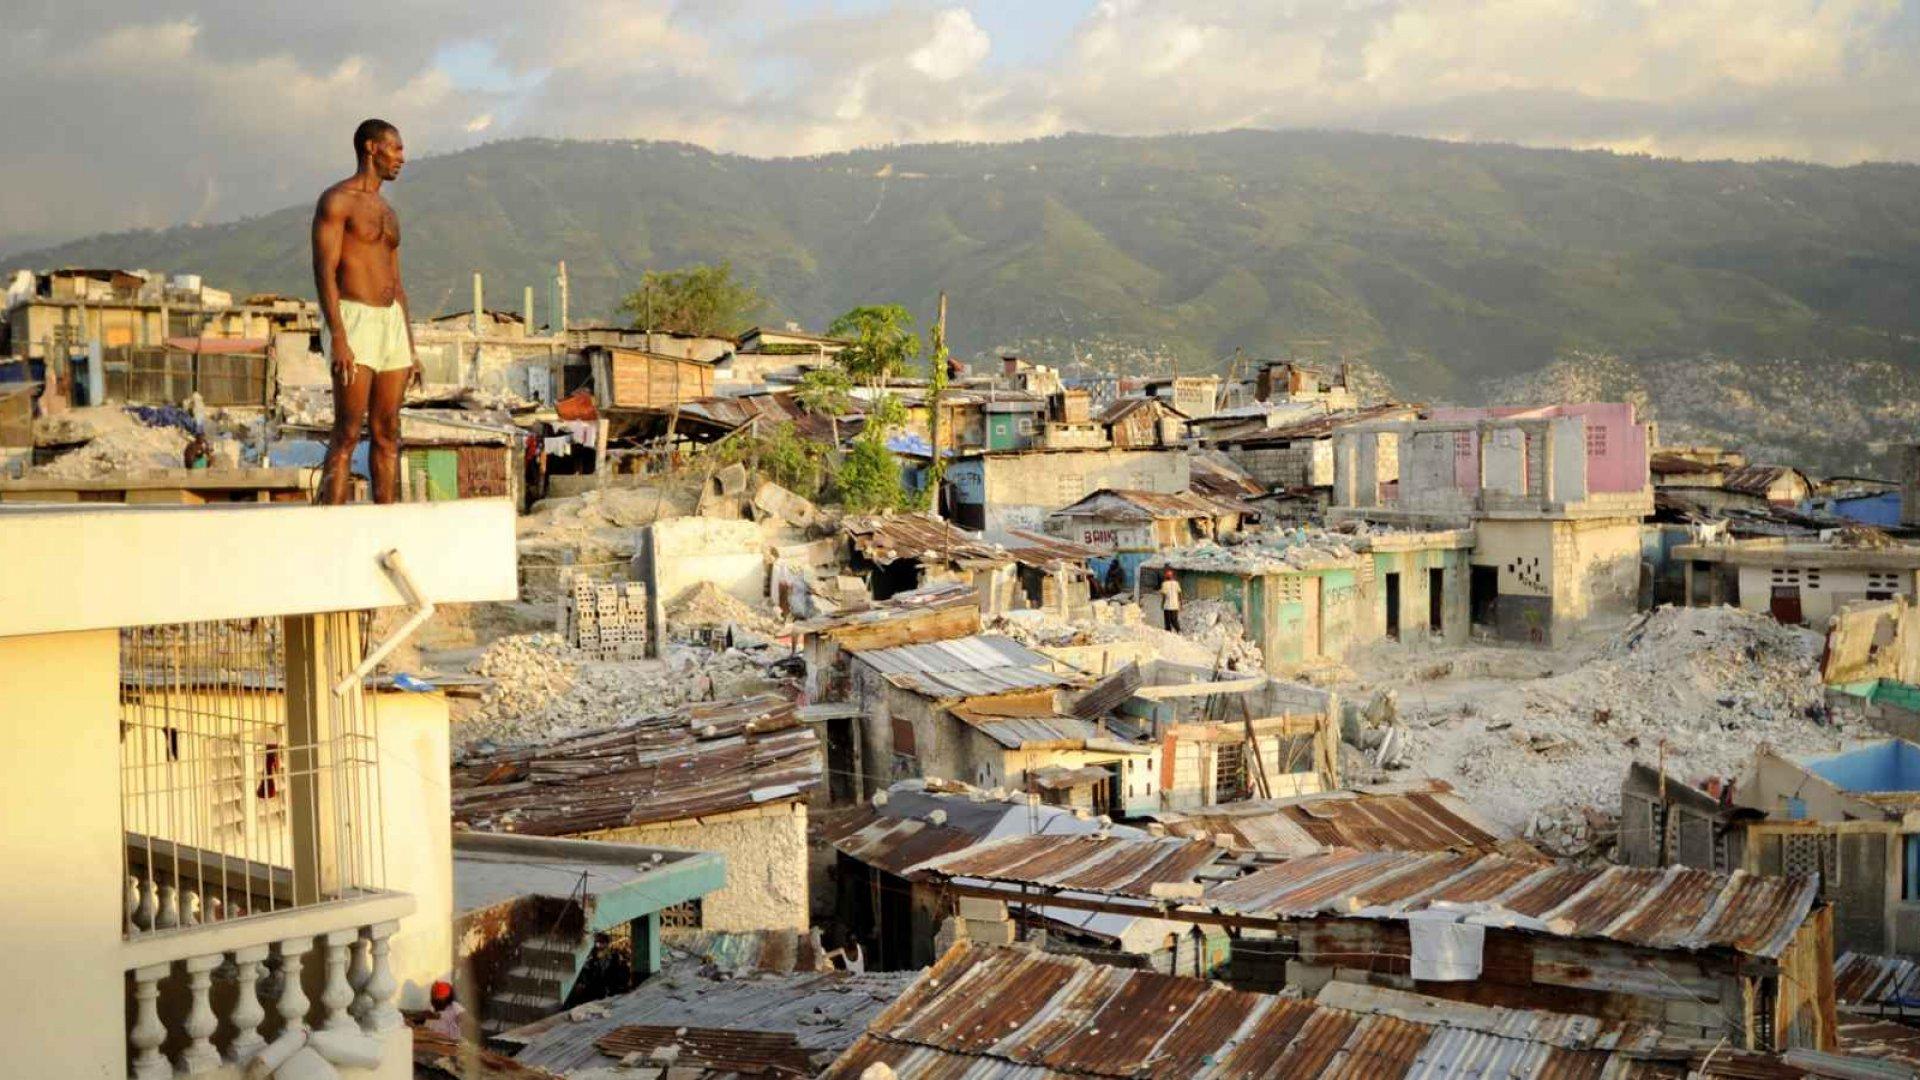 Port-Au-Prince six months after the earthquake.